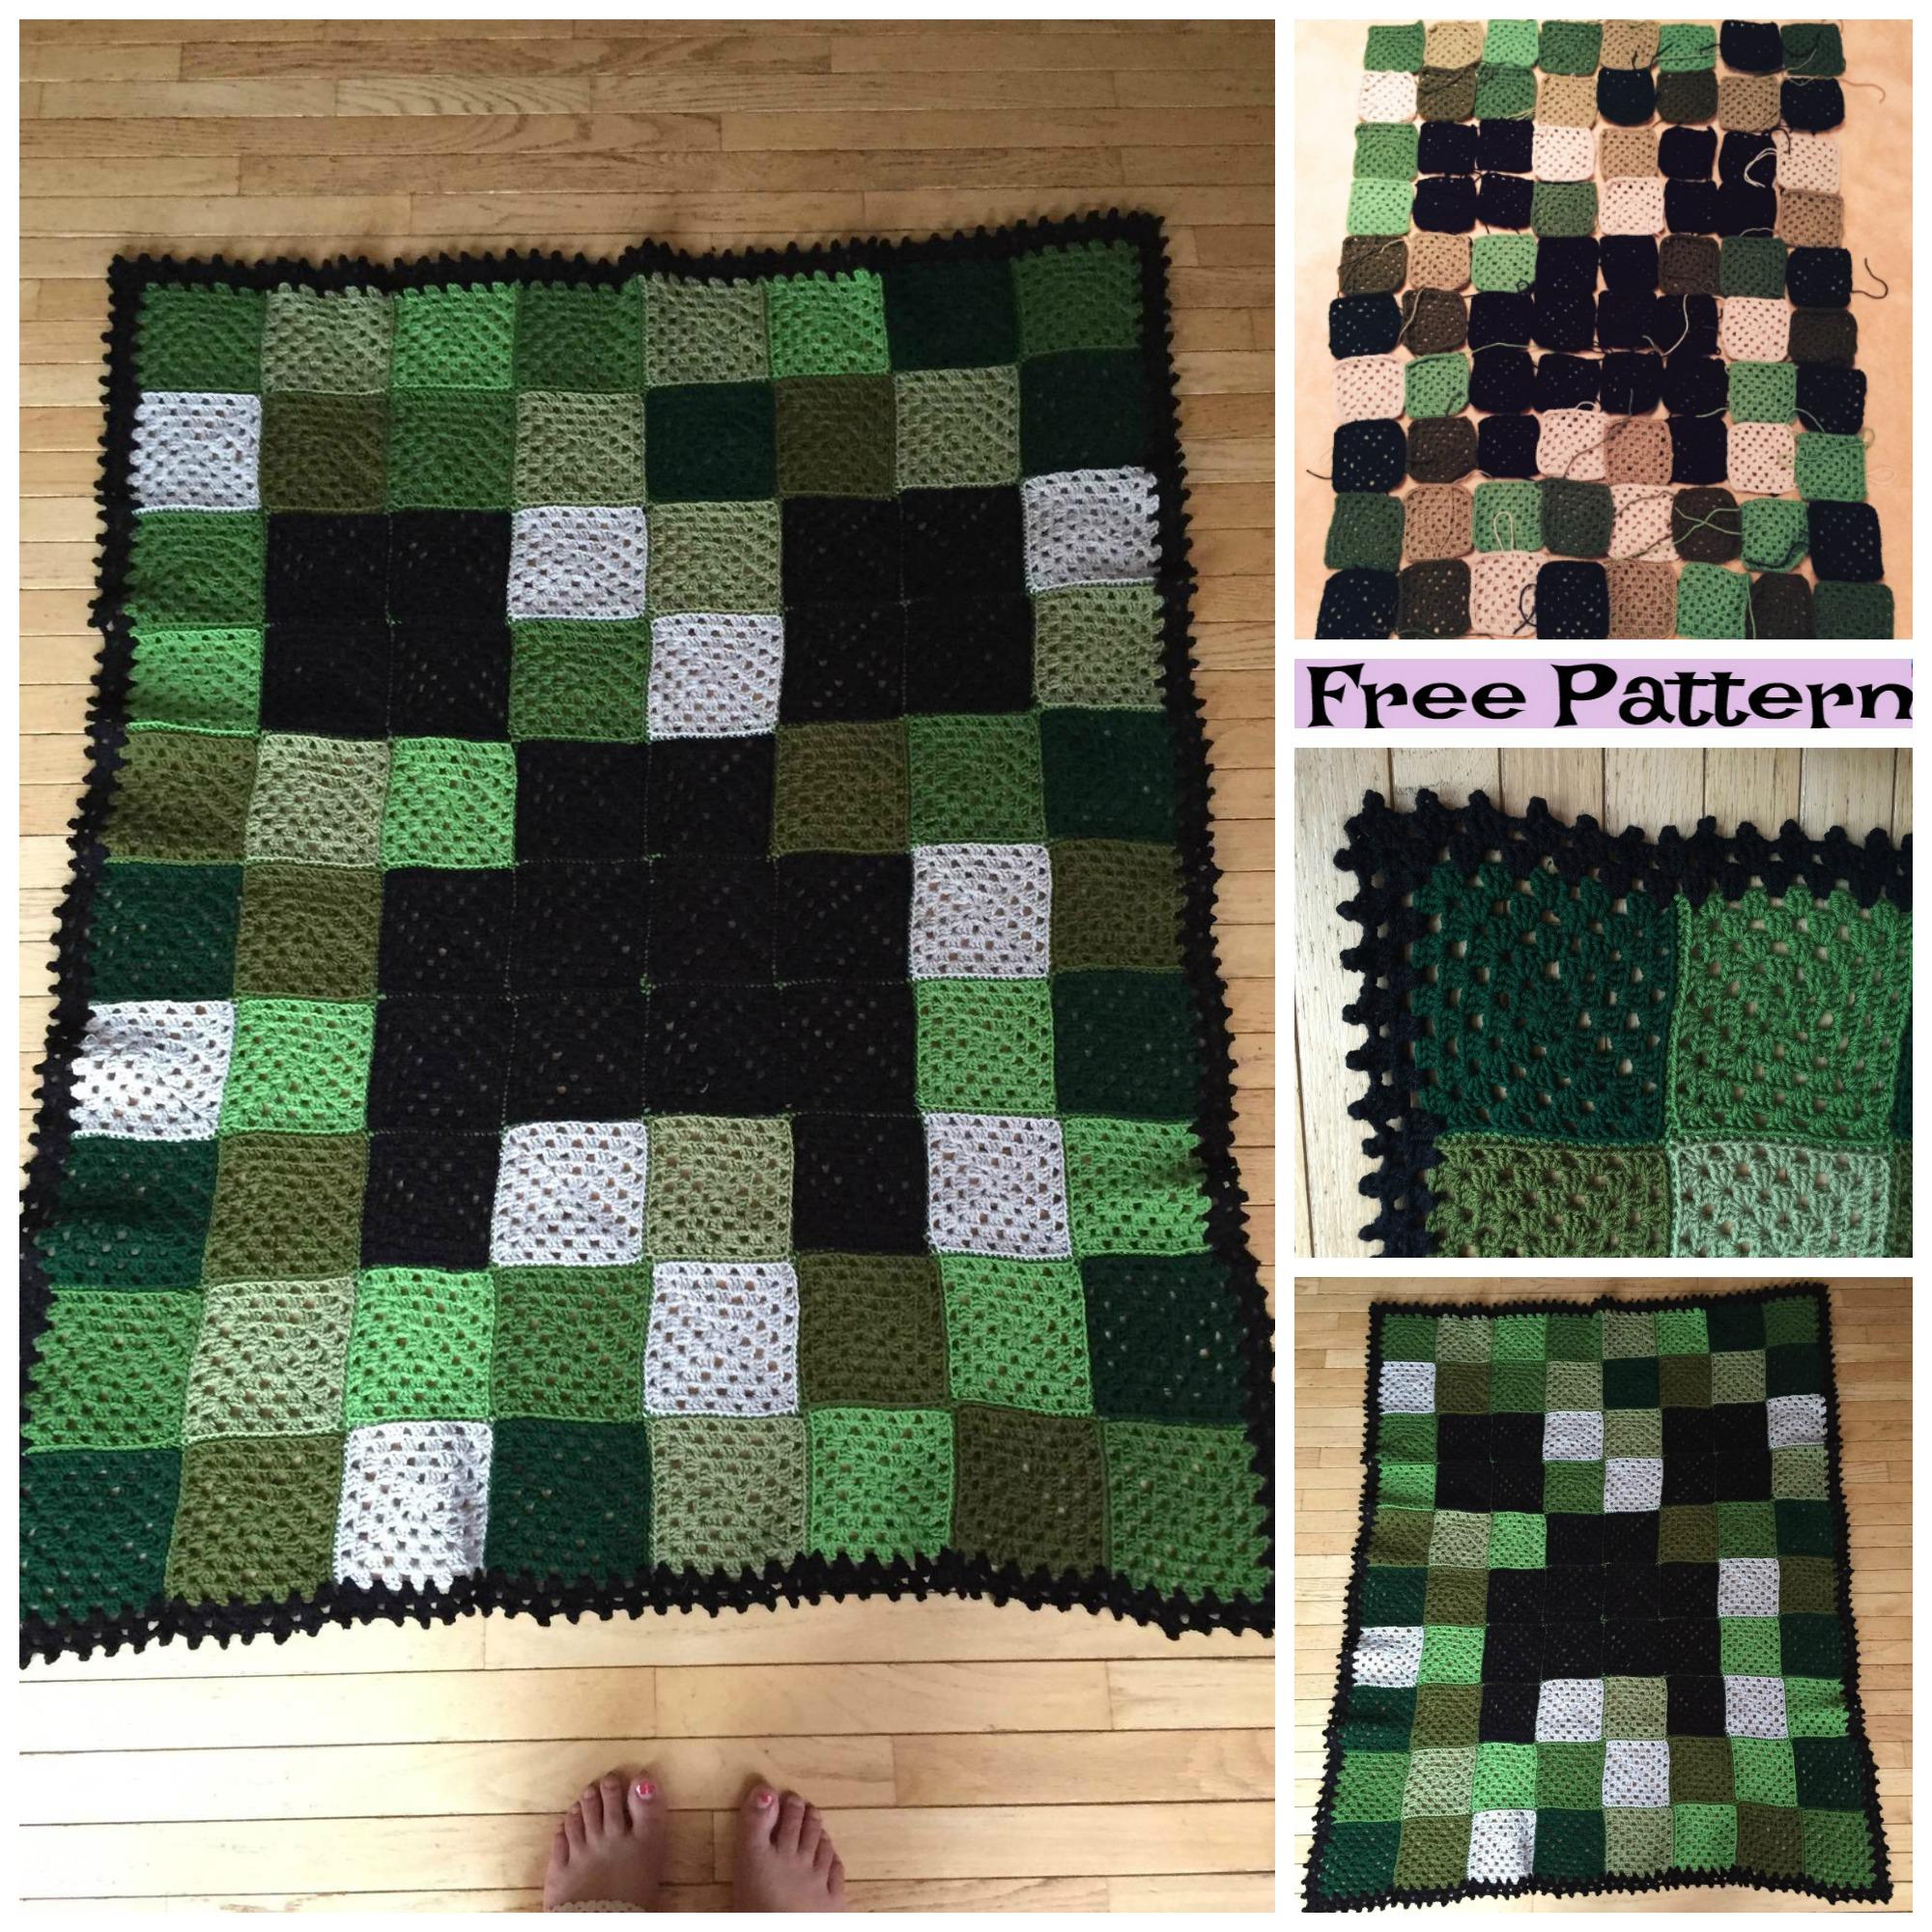 diy4ever-Minecraft Creeper Blanket - Free Patterns